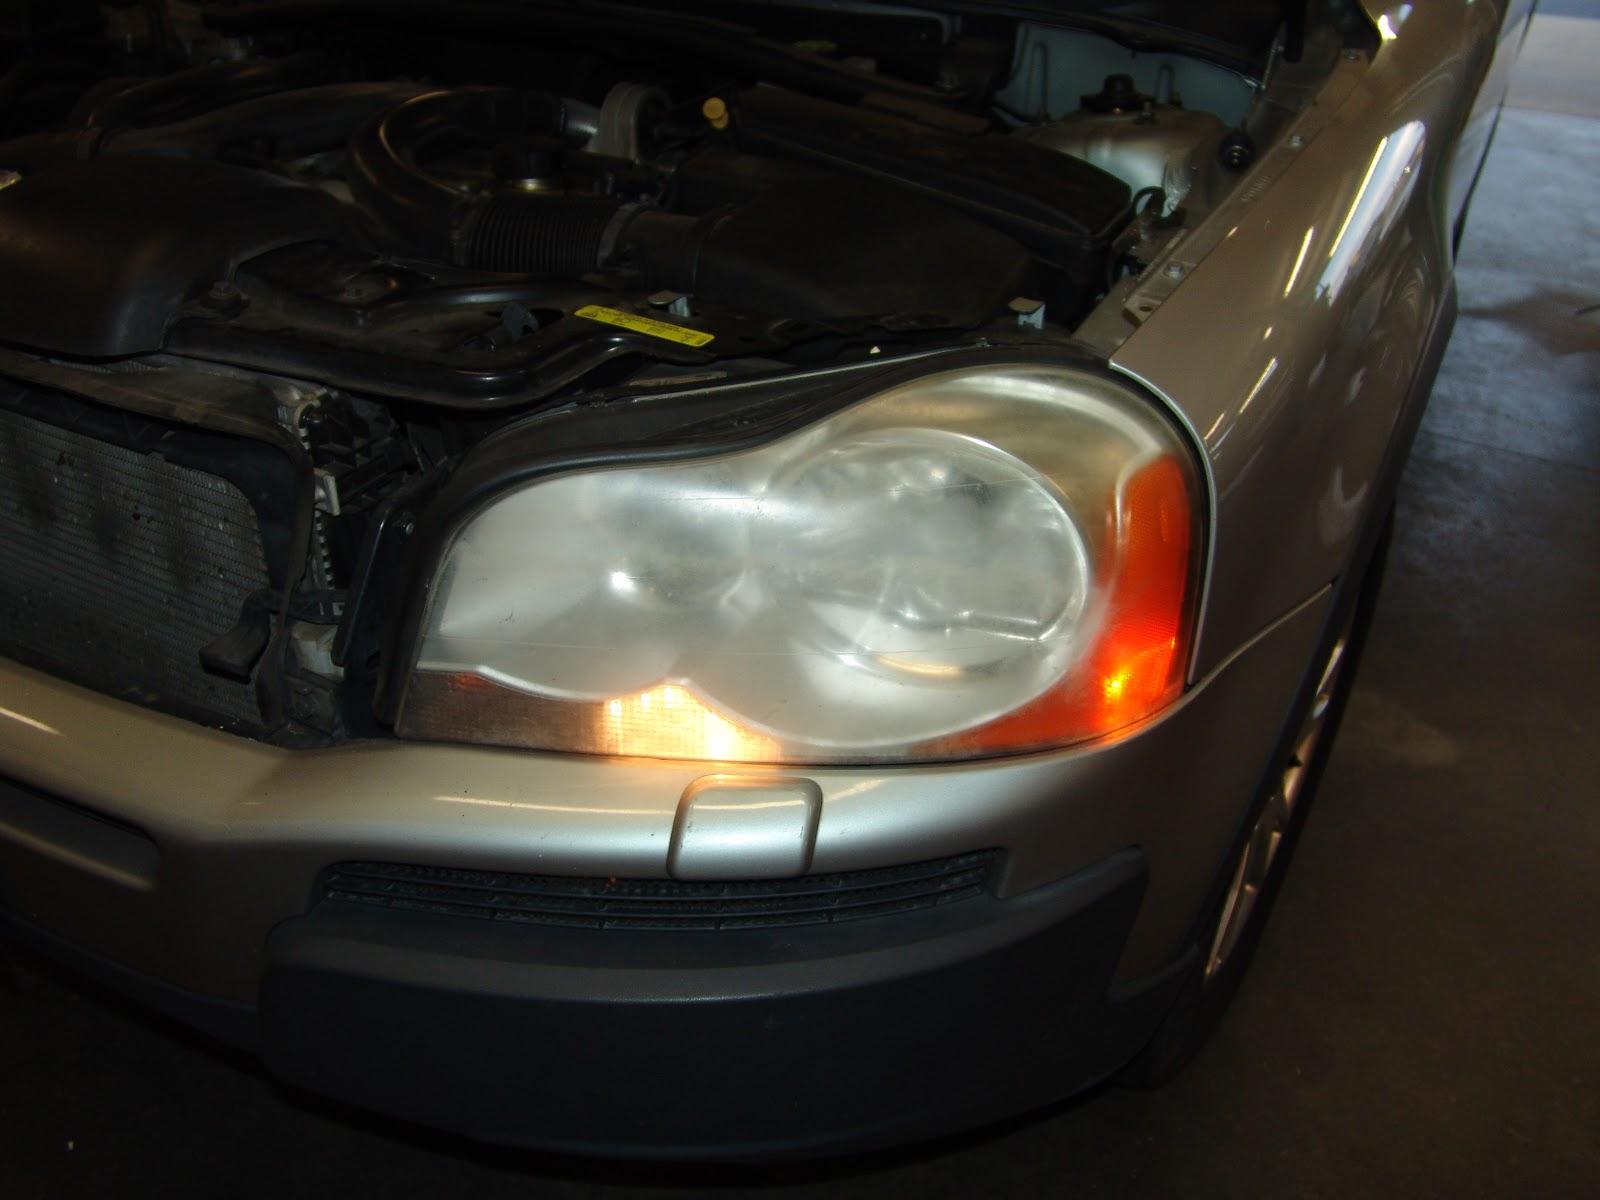 Volvo Xc90 Headlight Wiring Diagram : Volvo xc headlight hid wiring harness install